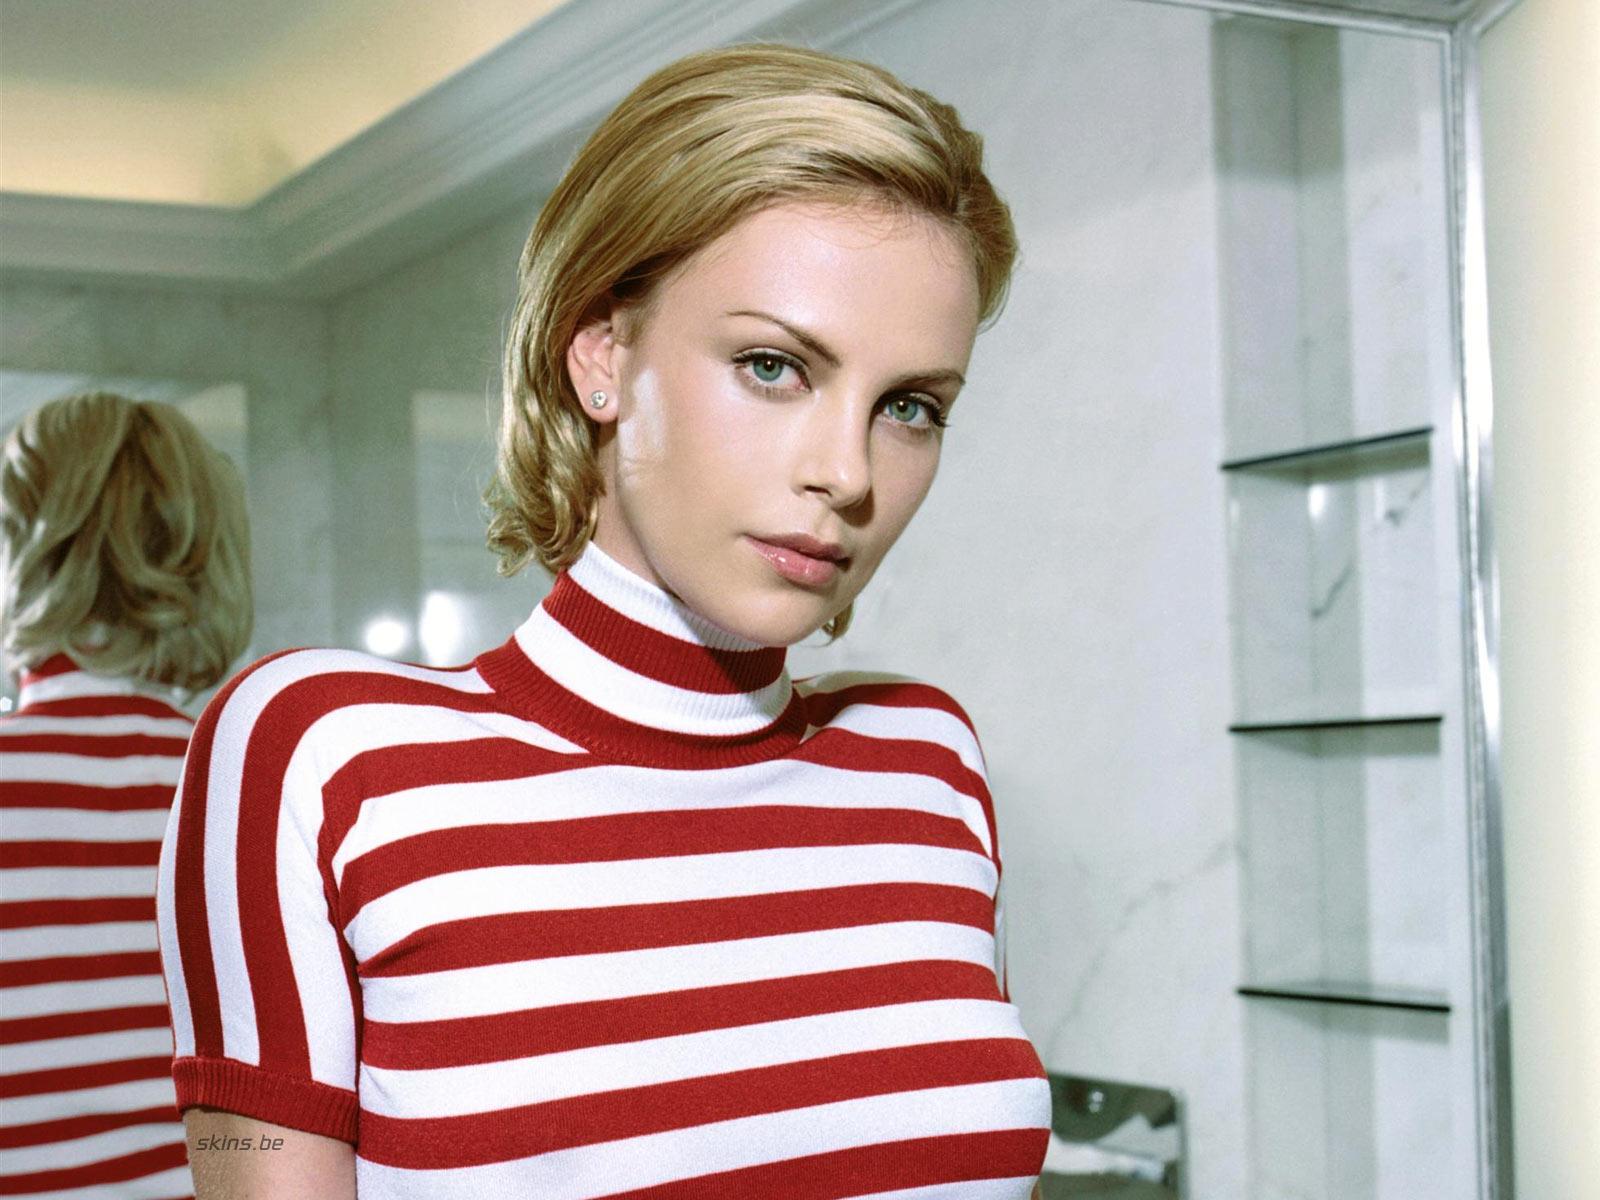 http://3.bp.blogspot.com/_GCAuqodmOE4/TS_ZIkAX6GI/AAAAAAAAG-4/aY_38x3LM6w/s1600/Charlize+Theron+In+Sexy+Strip+Shirt+Photos+%252811%2529.jpg